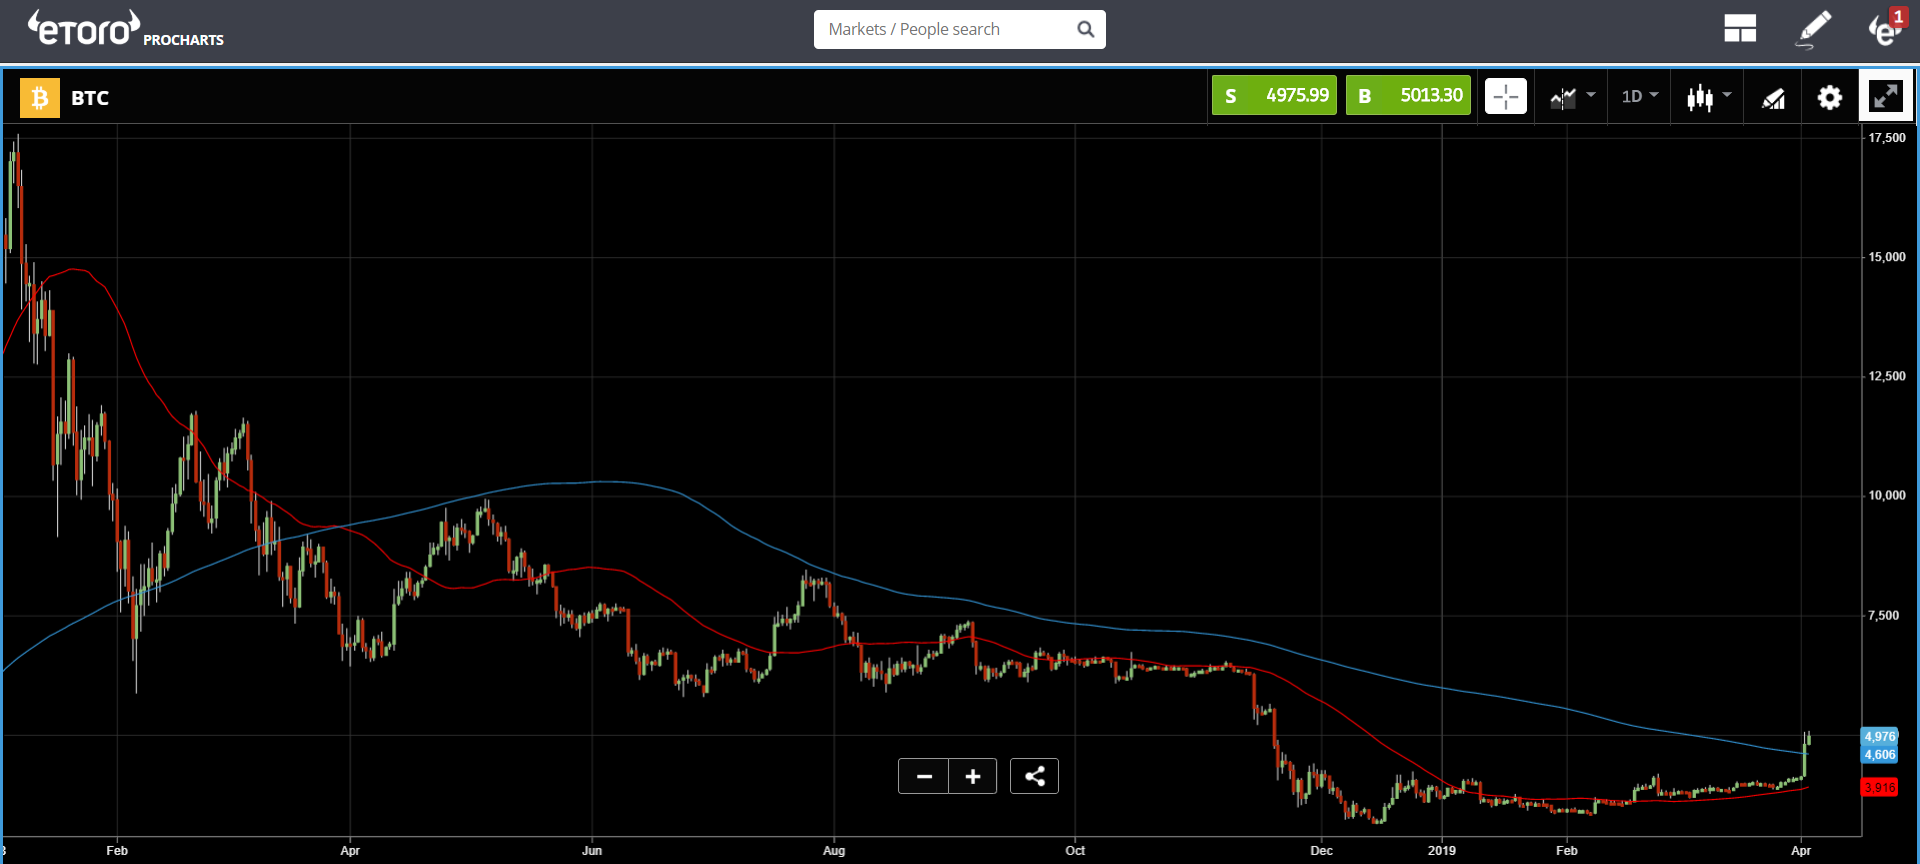 cryptocurrency, crypto, market, trading, bitcoin, blockchain, ethereum, stocks